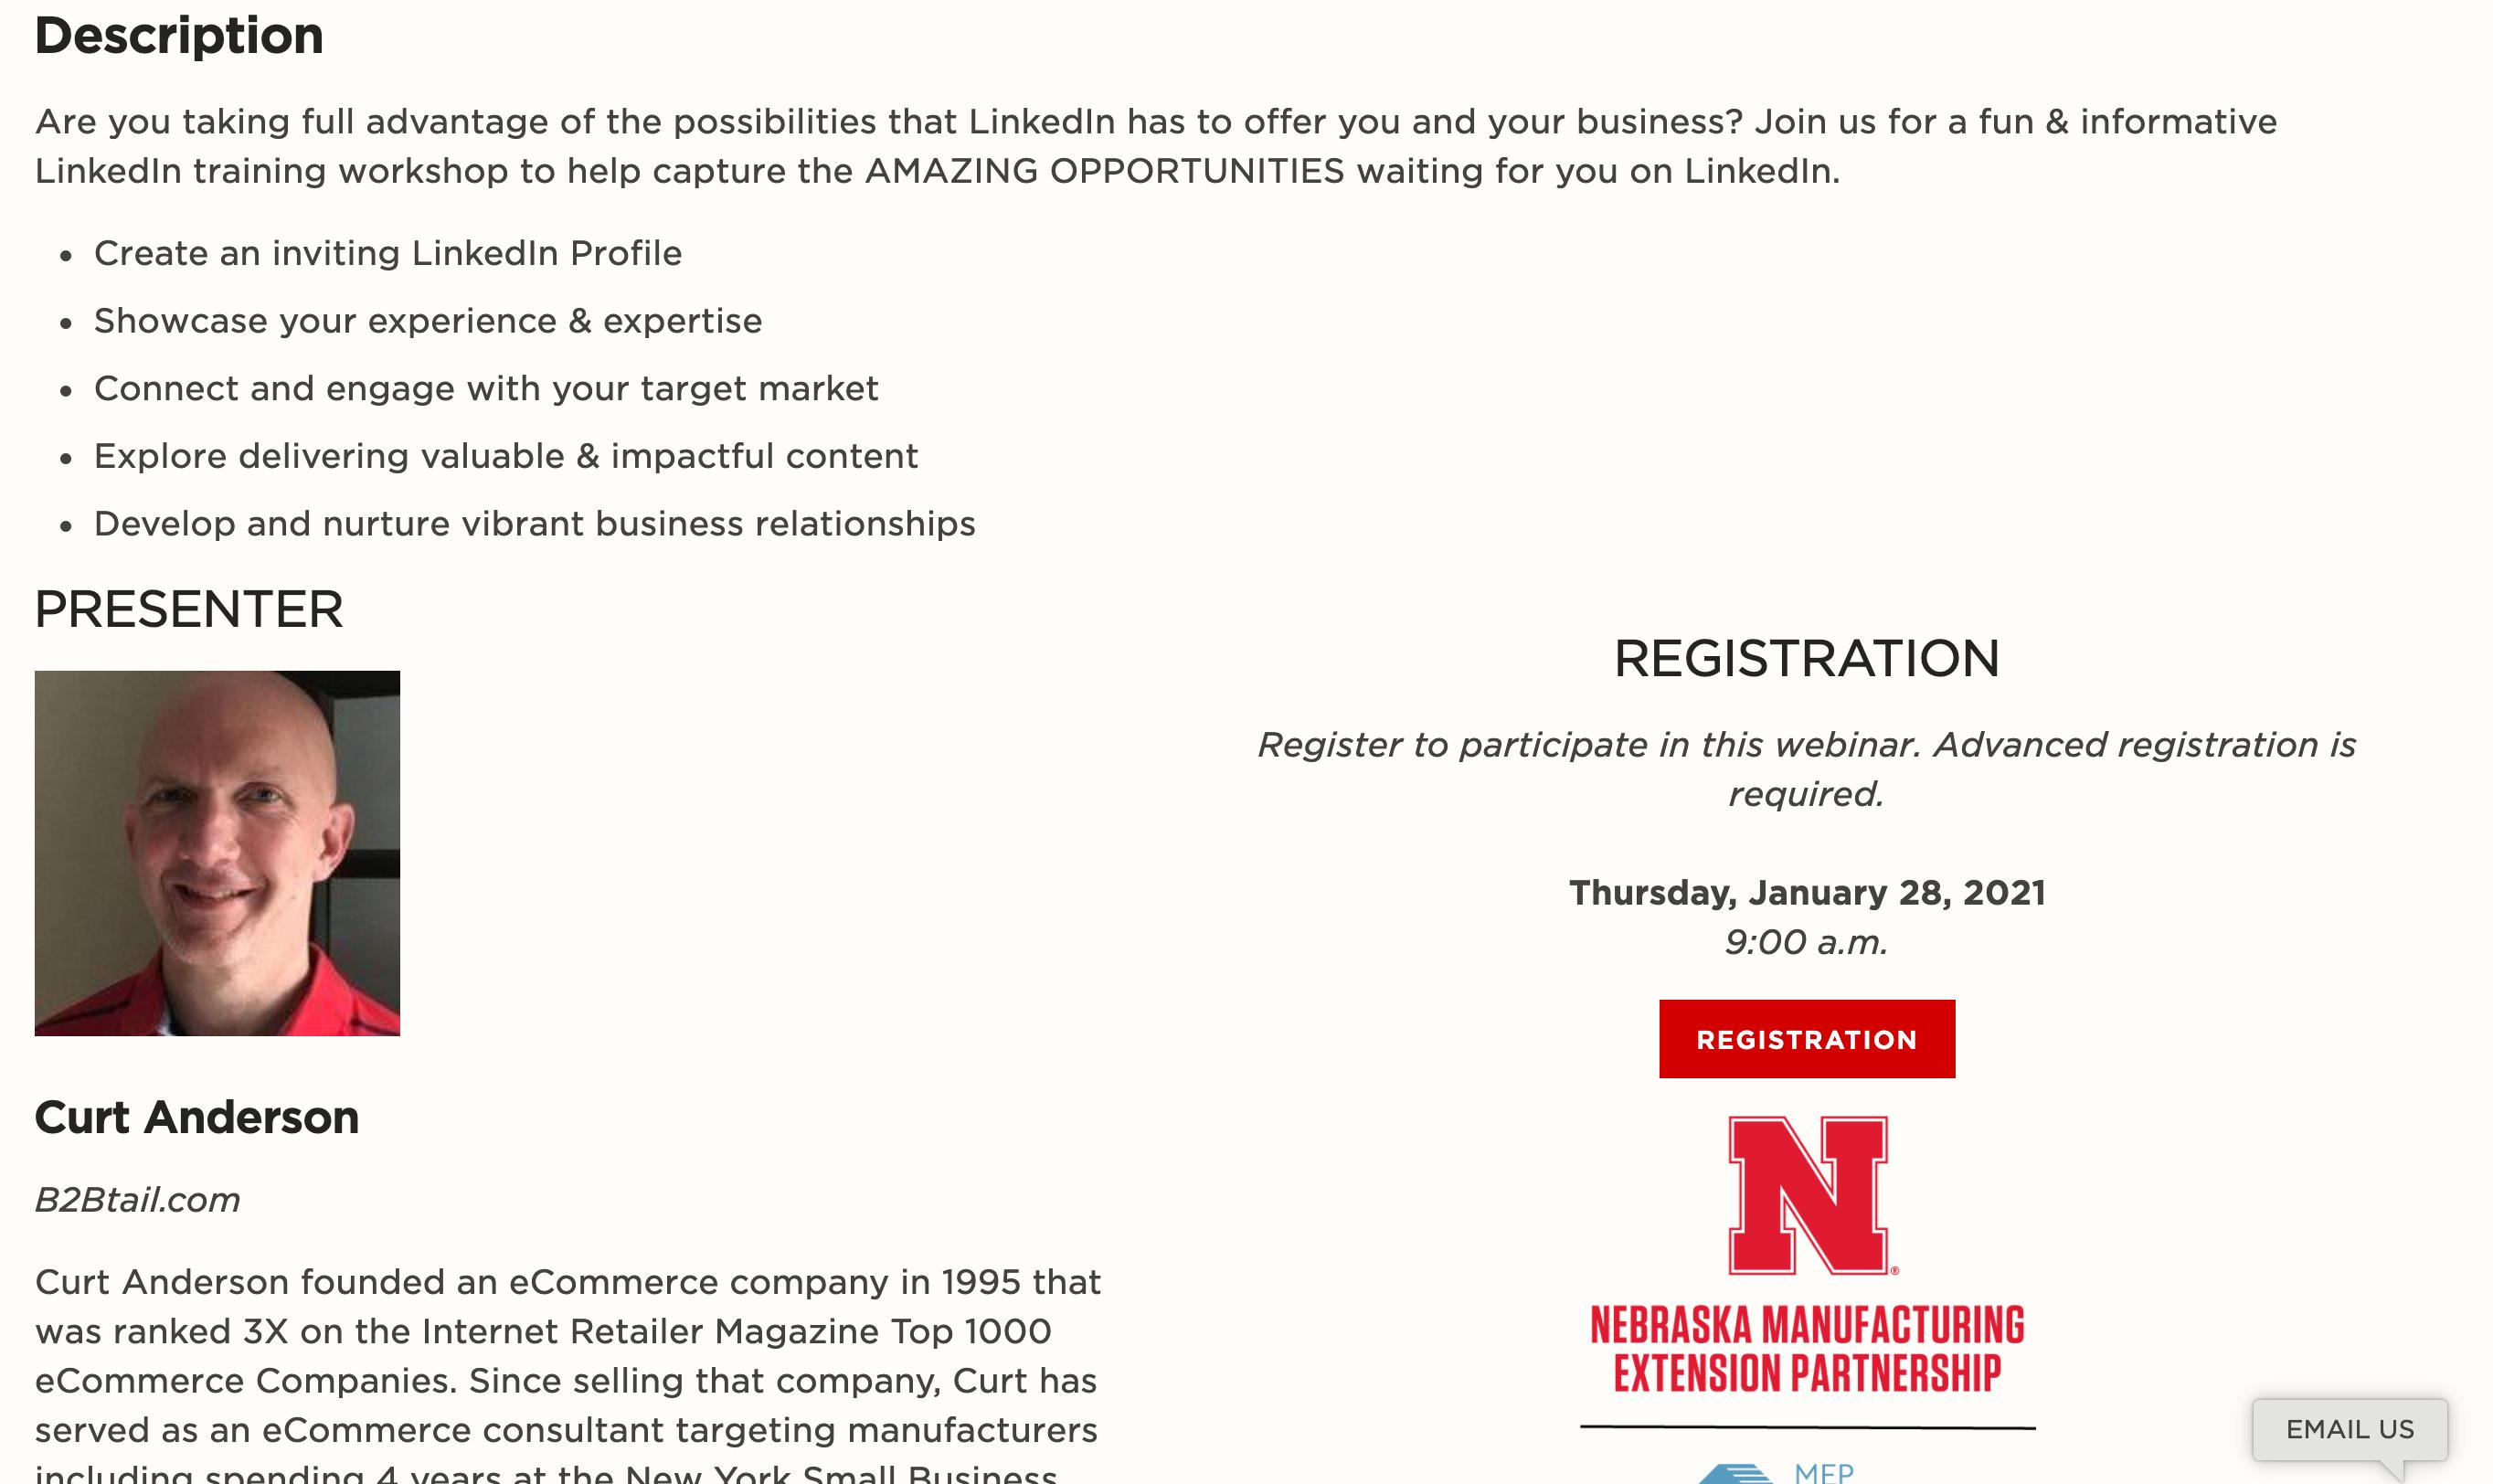 University of Nebraska MEP, Falconer Electronics Featured in University of Nebraska MEP LinkedIn Workshop